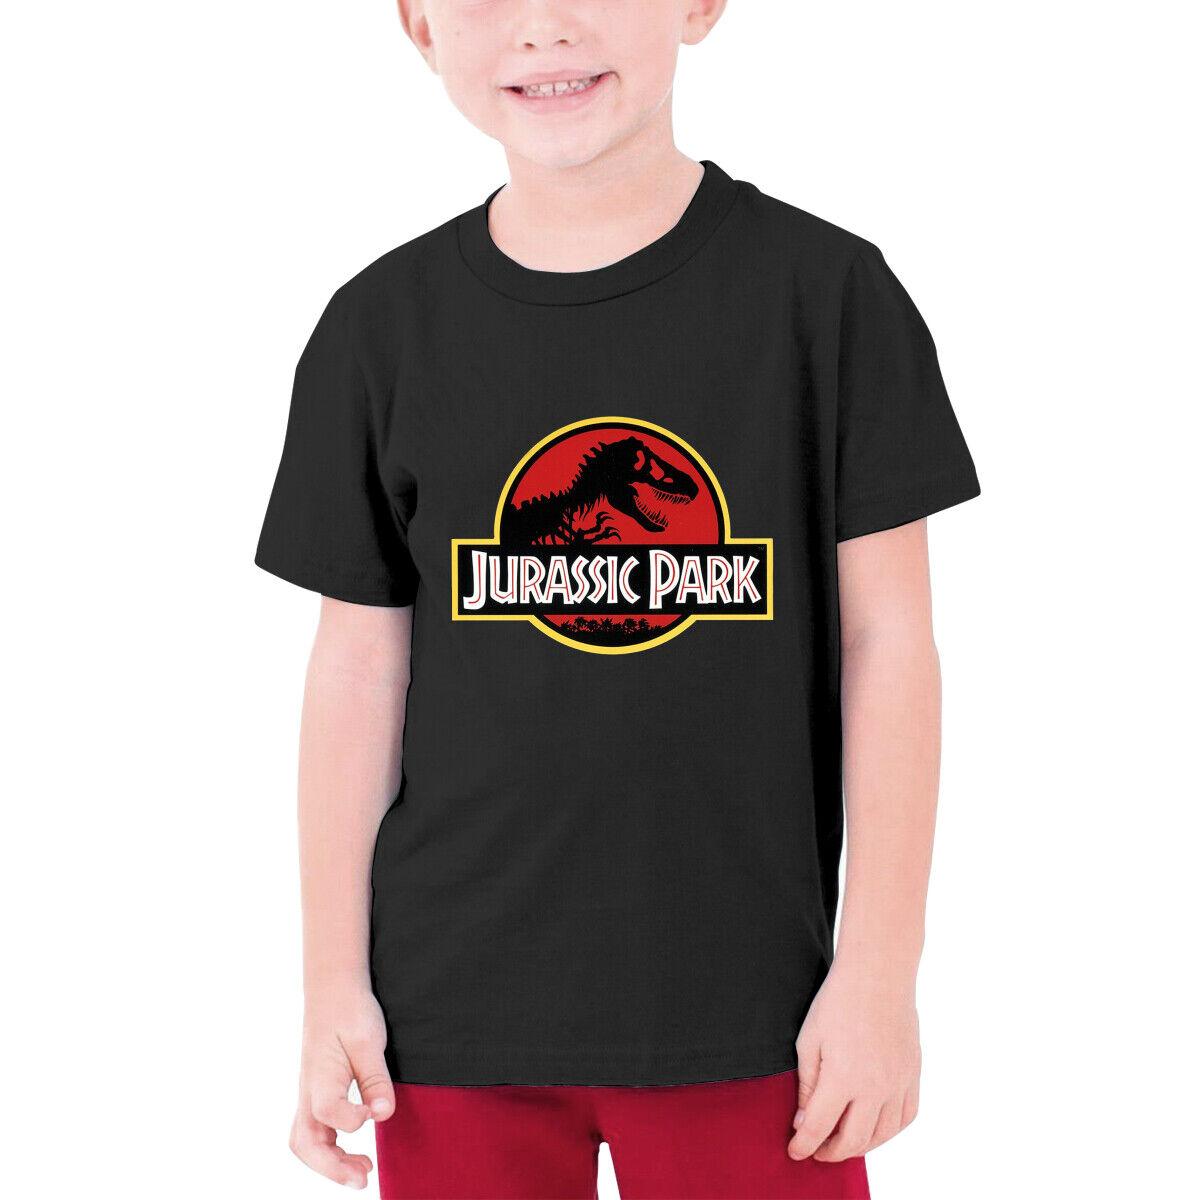 Jurassic Park Dinosaur Graphic Kids Boys Short Sleeve T Shirt Crew